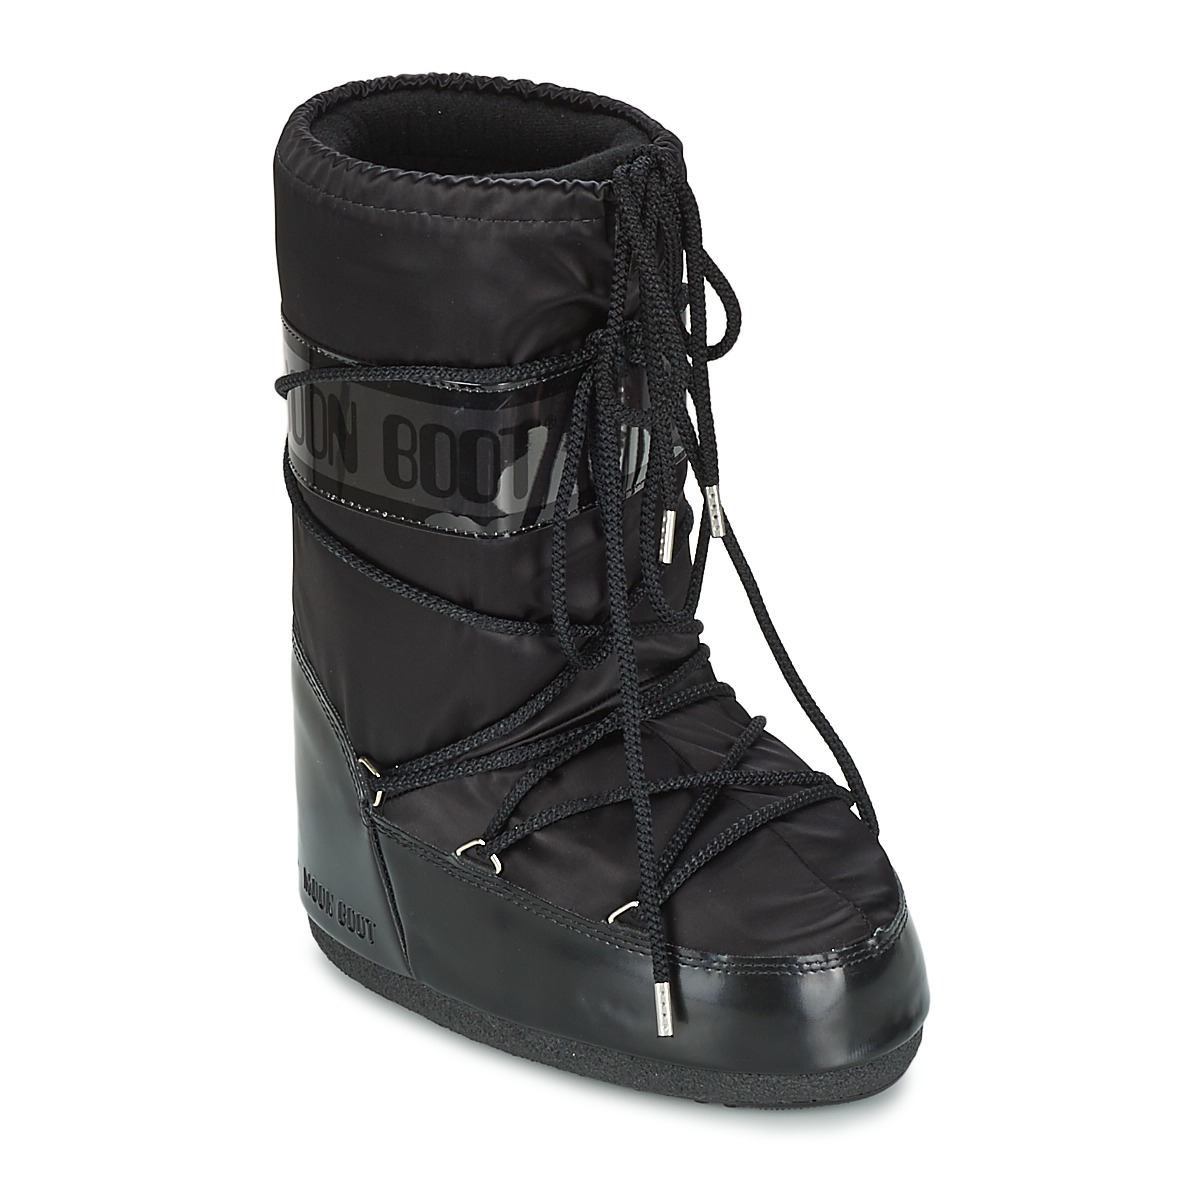 Rea Dam utseende Moon Boot MOON BOOT W E SOFT MET Svart